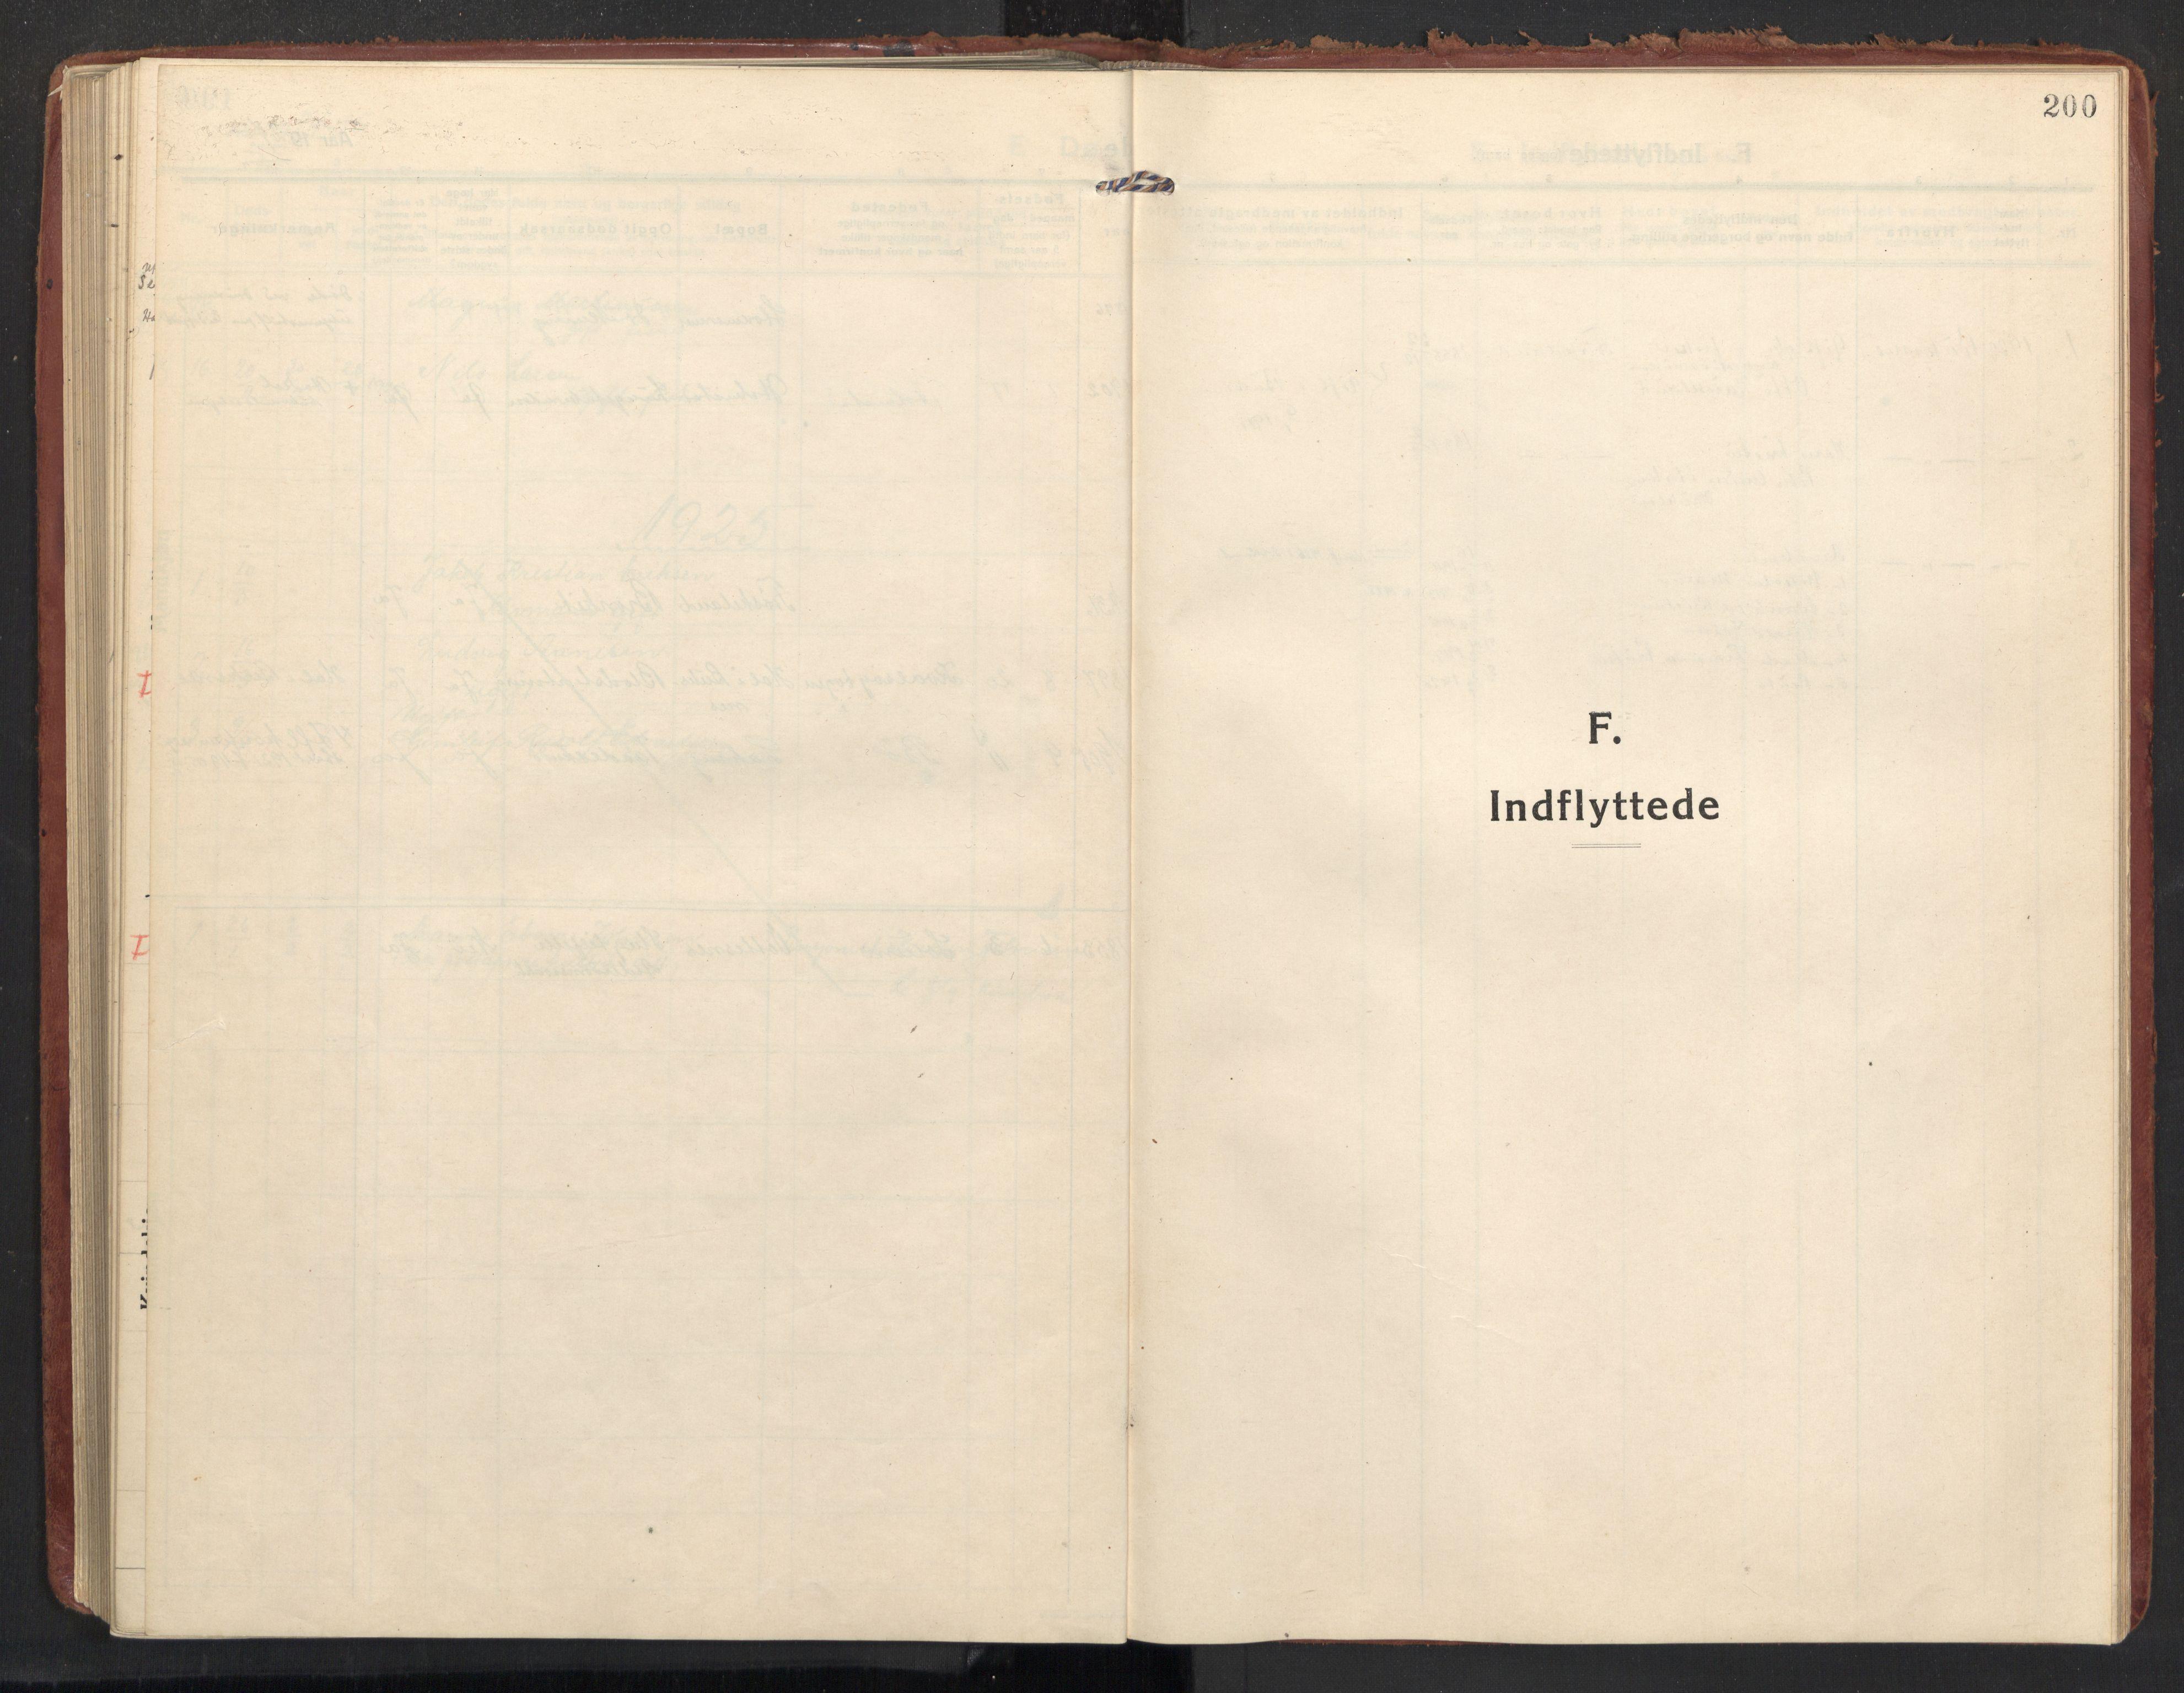 SAT, Ministerialprotokoller, klokkerbøker og fødselsregistre - Nordland, 890/L1288: Ministerialbok nr. 890A03, 1915-1925, s. 200